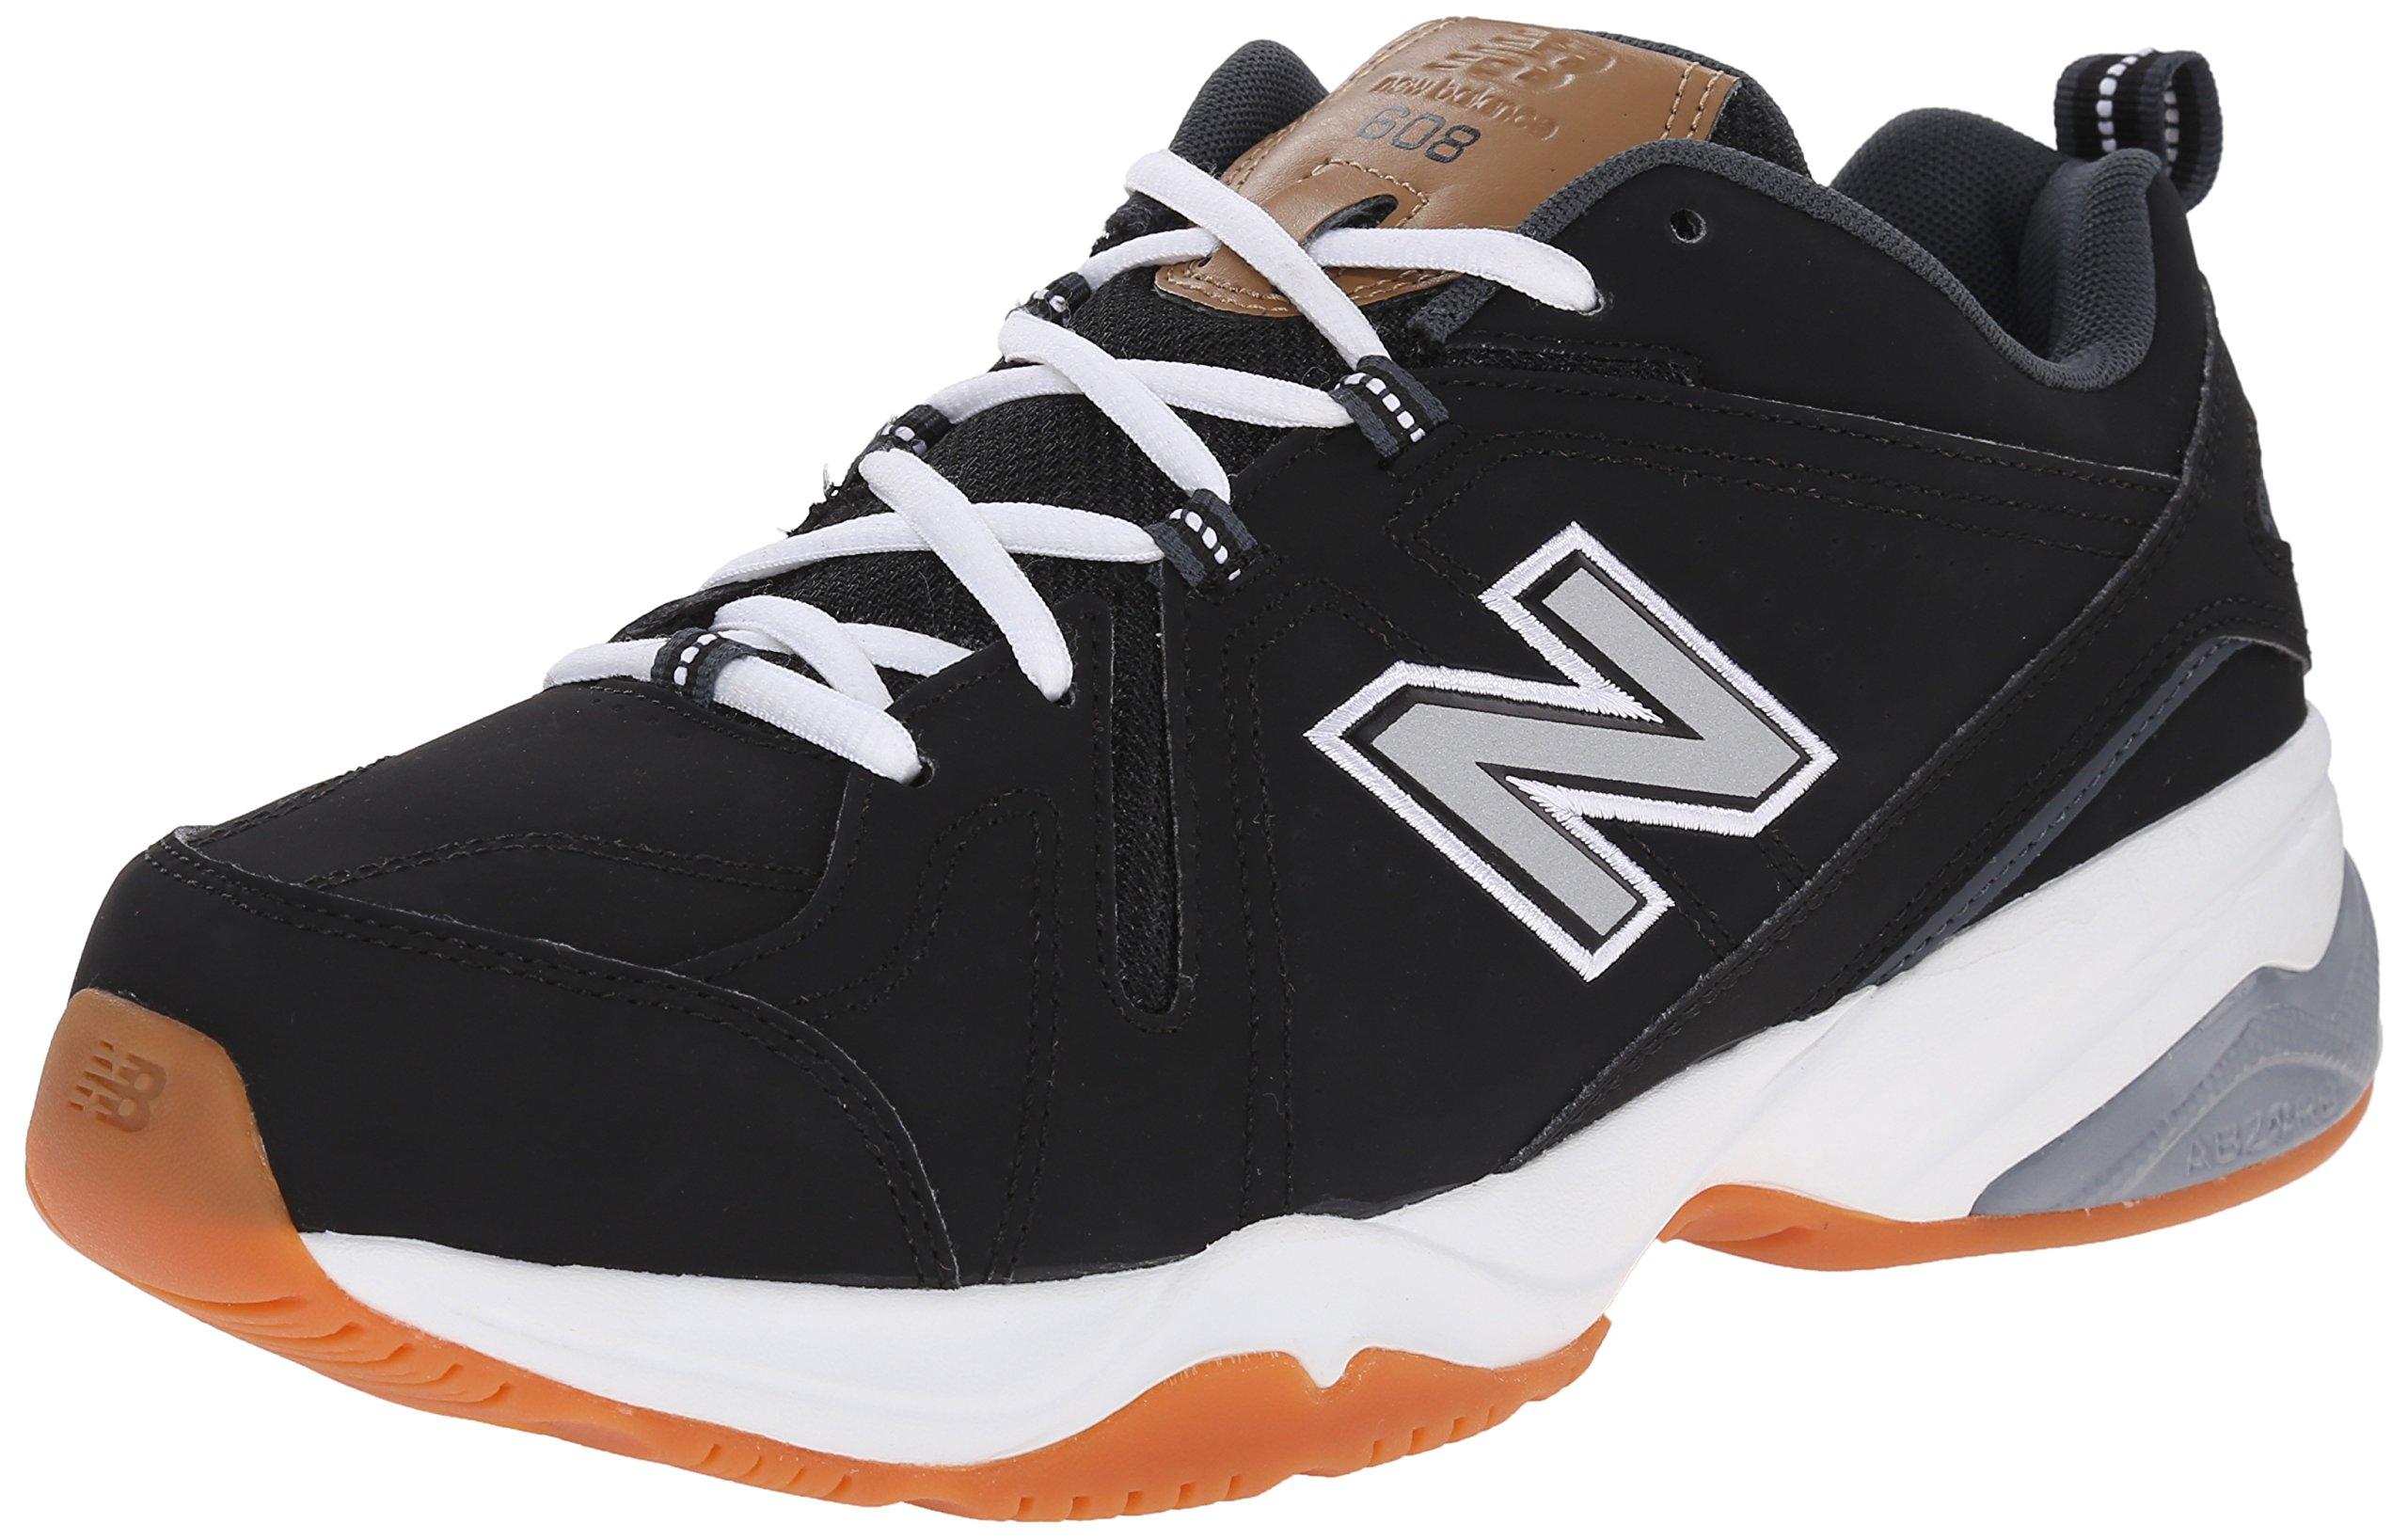 New Balance Men's MX608V4 Training Shoe, Black/White, 11.5 D US